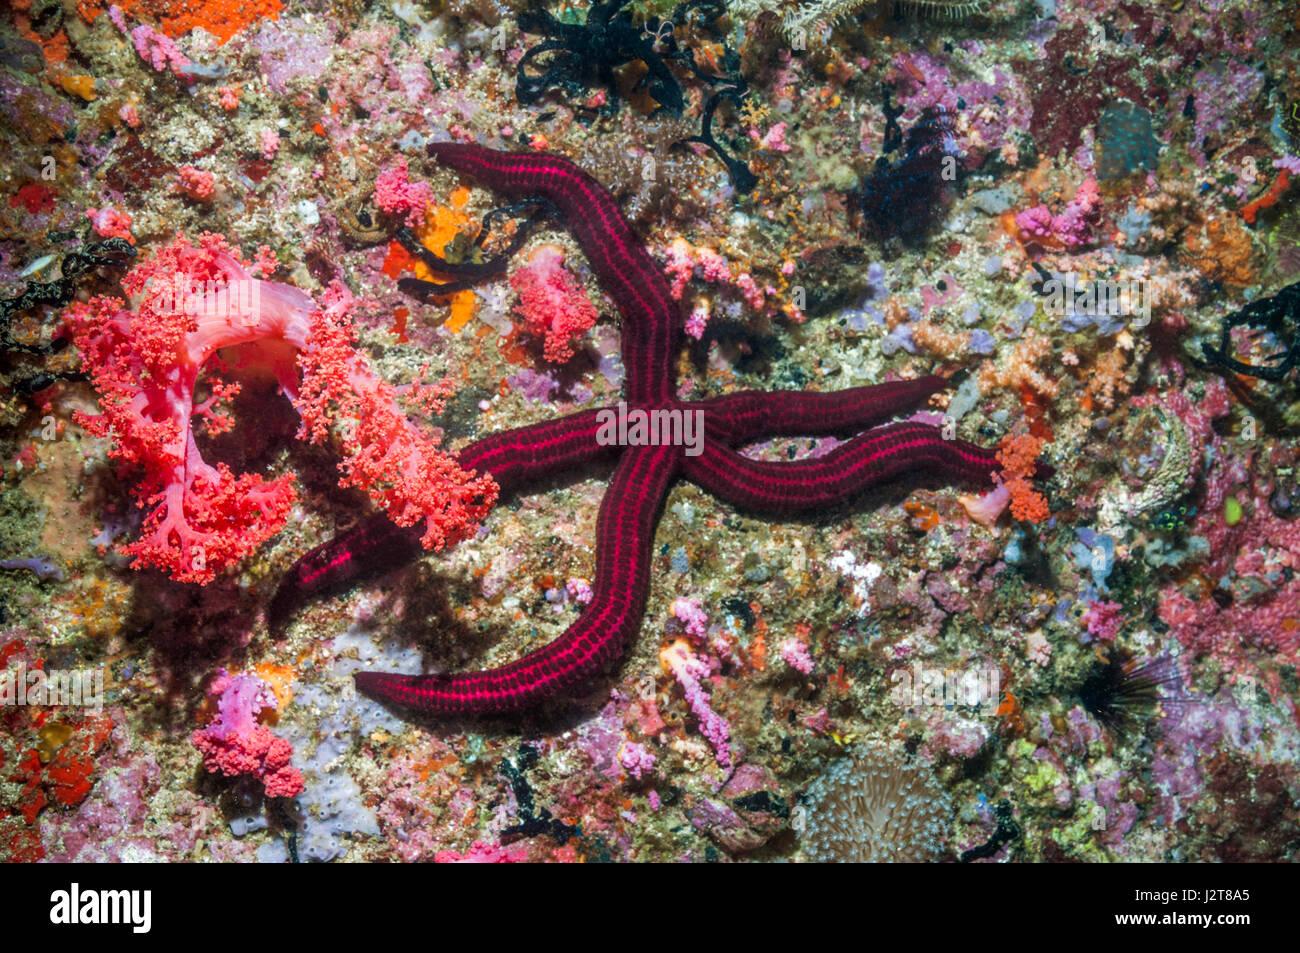 Velvety sea star [Leiaster speciosus].  Cebu, Malapascua Island, Philippines. - Stock Image